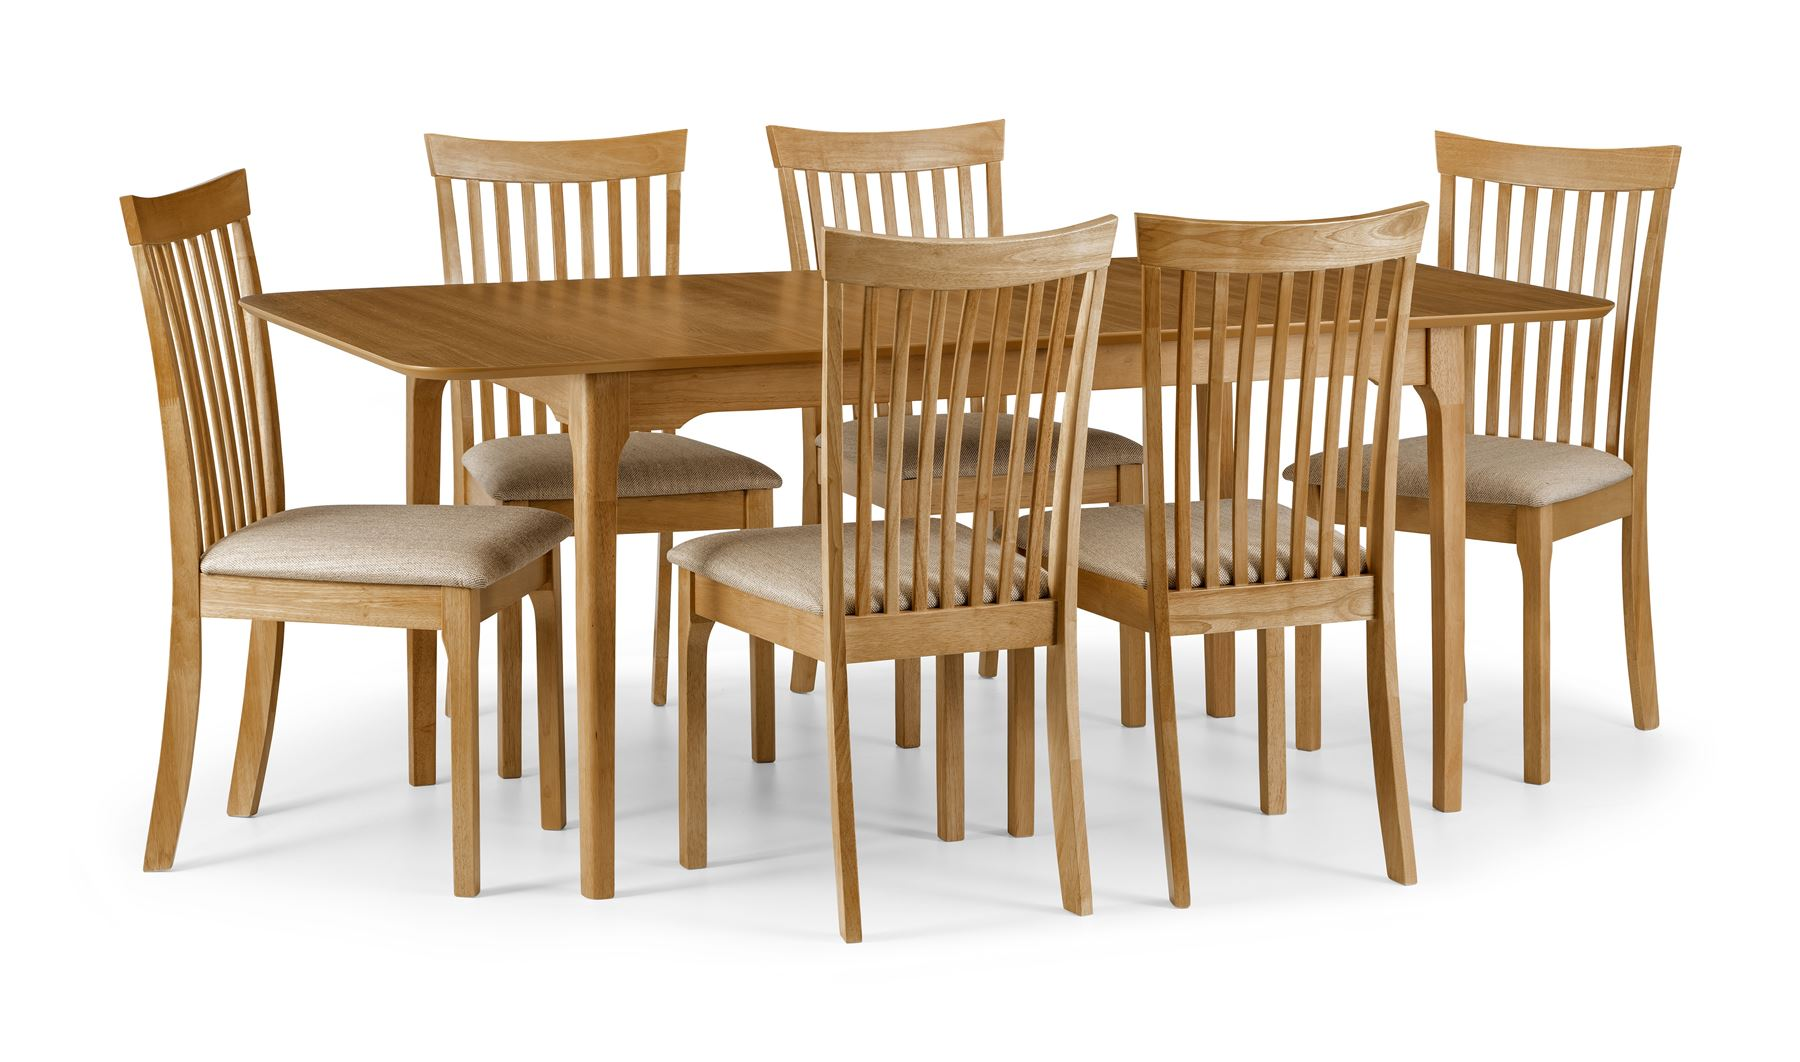 Julian Bowen Ibsen Light Oak Solid Wood Dining Chair With